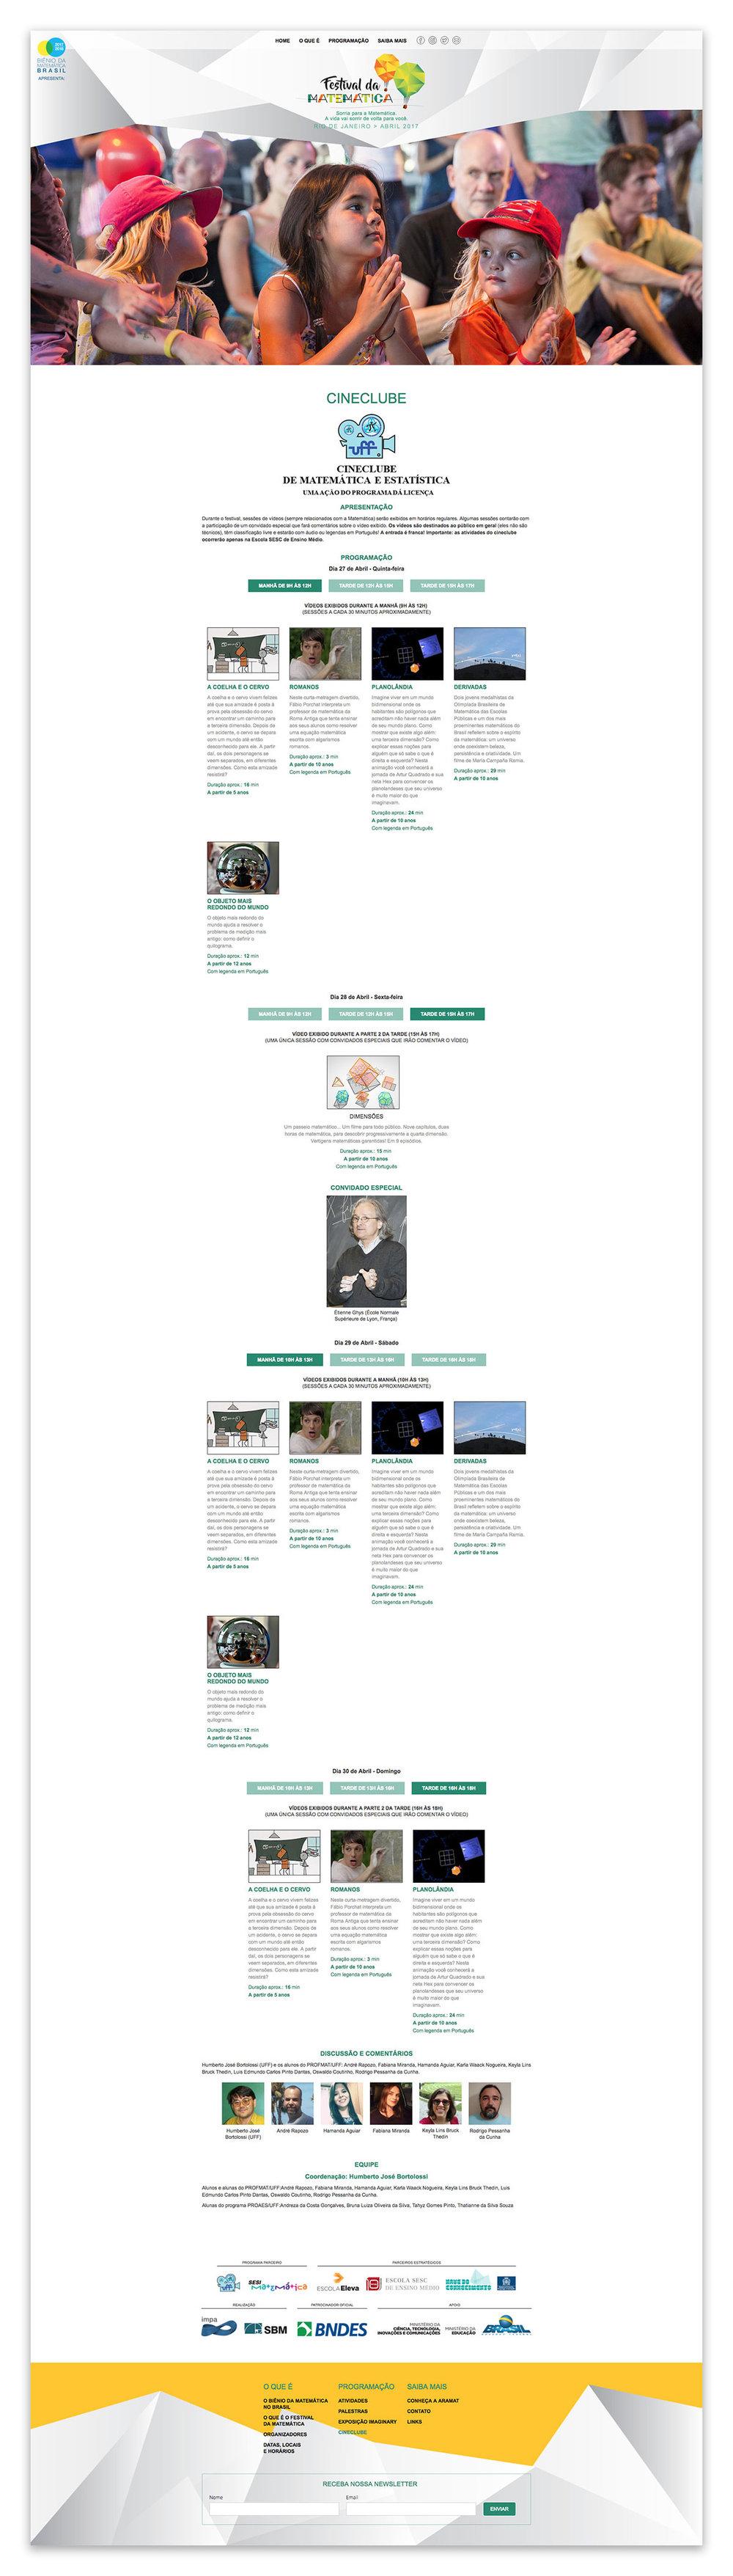 screencapture-festivaldamatematica-org-br-programacao-cineclube-1518613684195.jpg